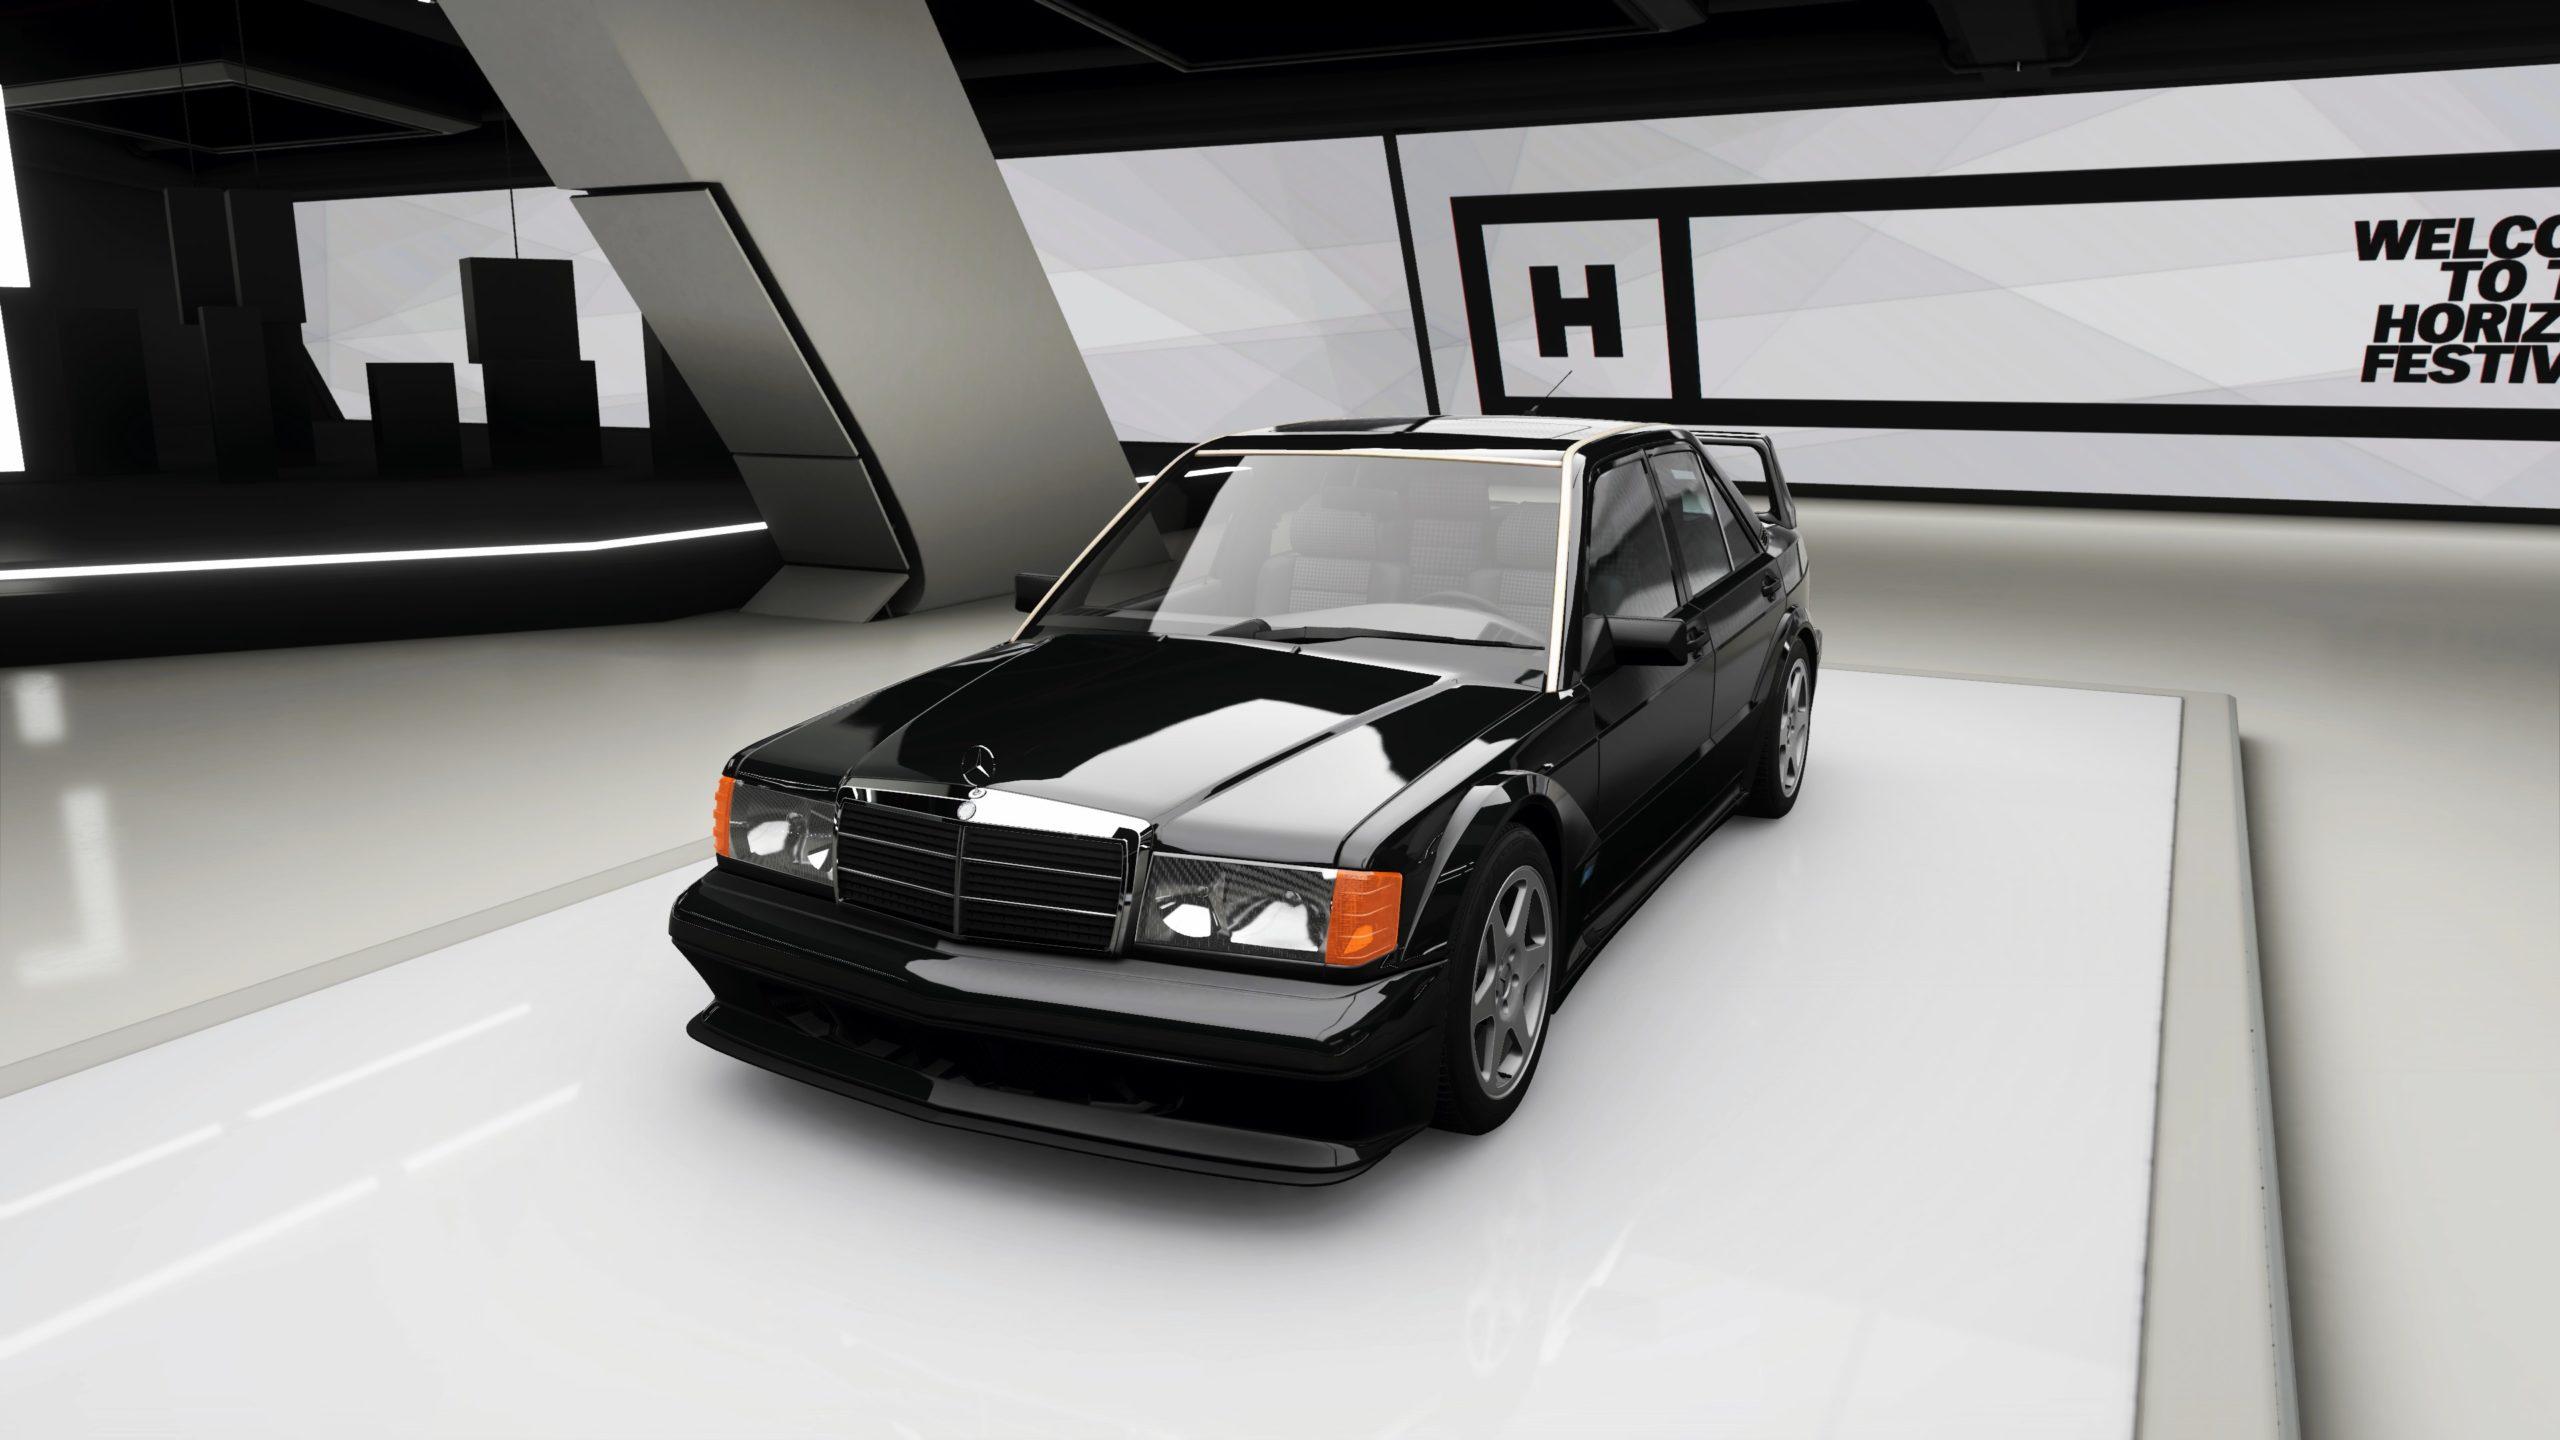 Forza-Horizon-4-Mercedes-Benz-190E-2-5-16-Evolution-II